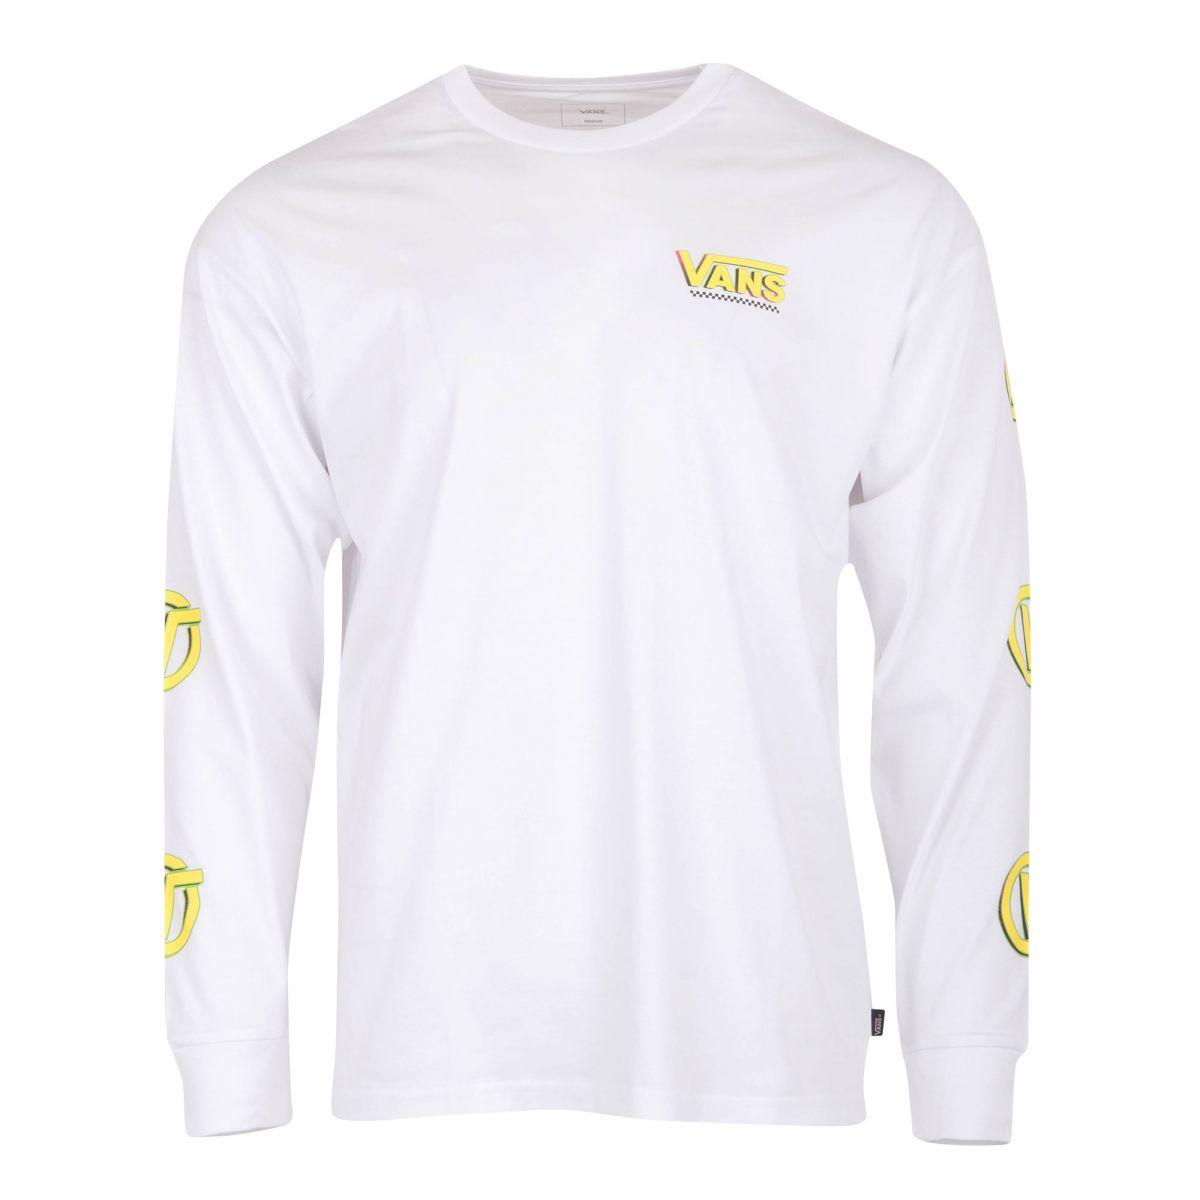 tee shirt vans femme marsue